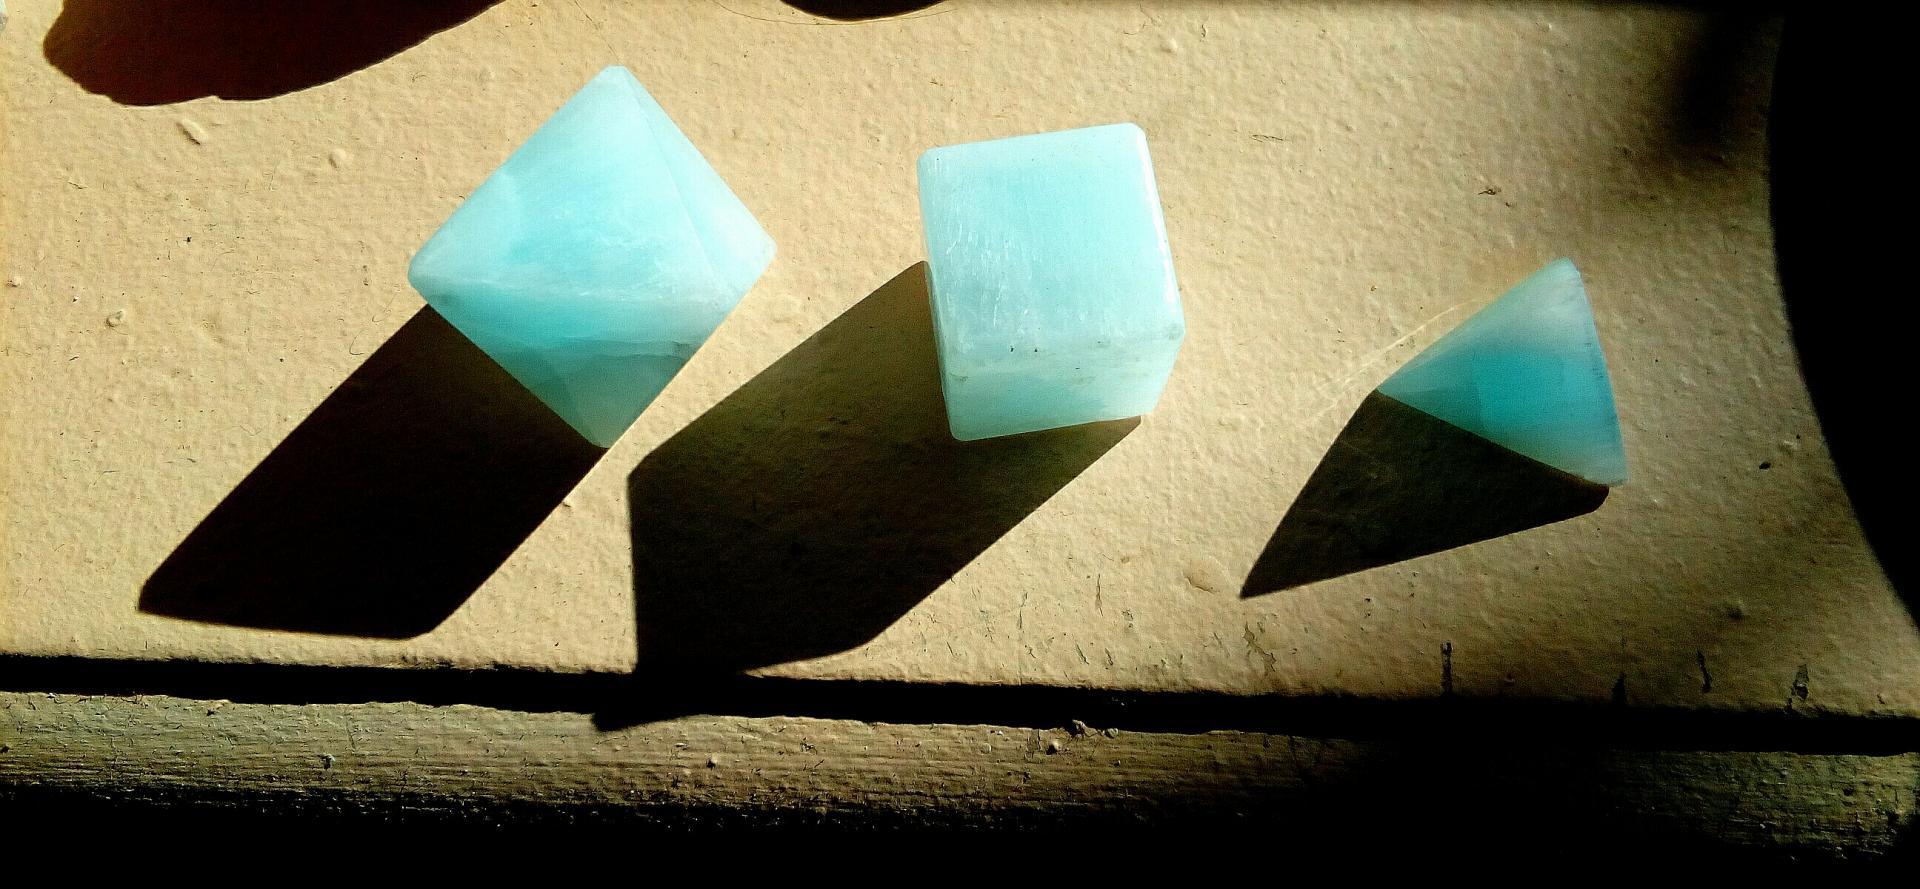 Solides Aragonite bleue